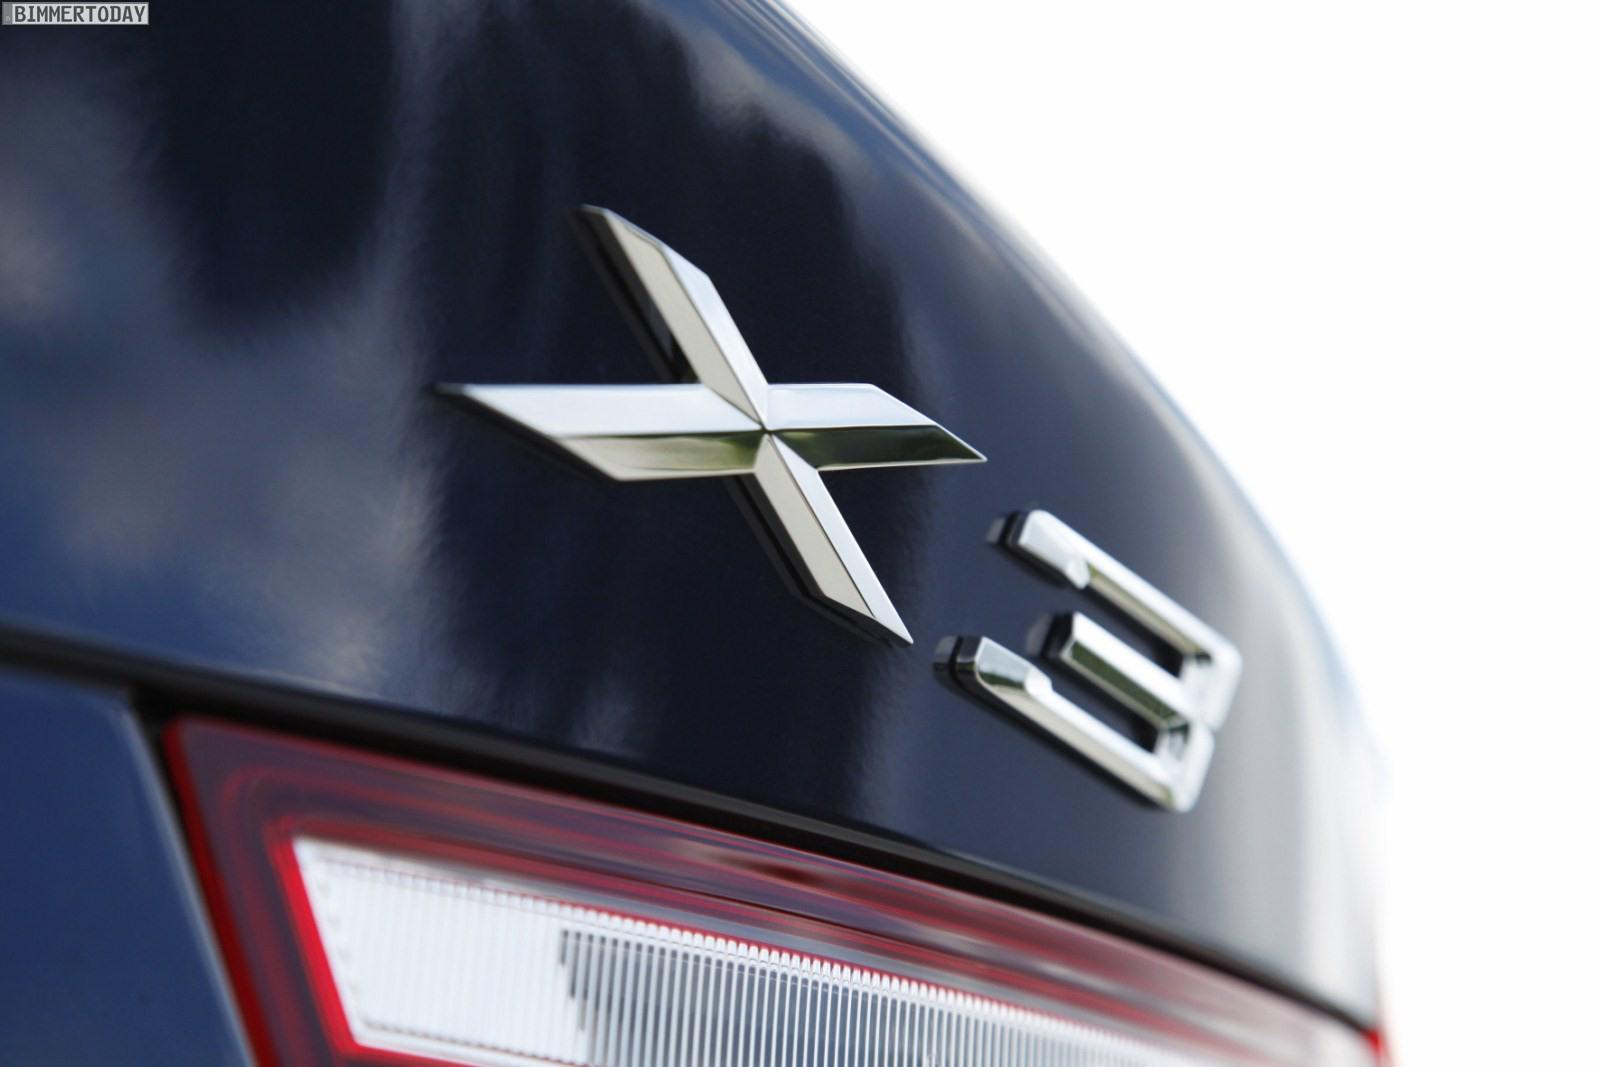 BMW X3 sDrive18d 2012 Spar Diesel Hinterradantrieb 2WD 05